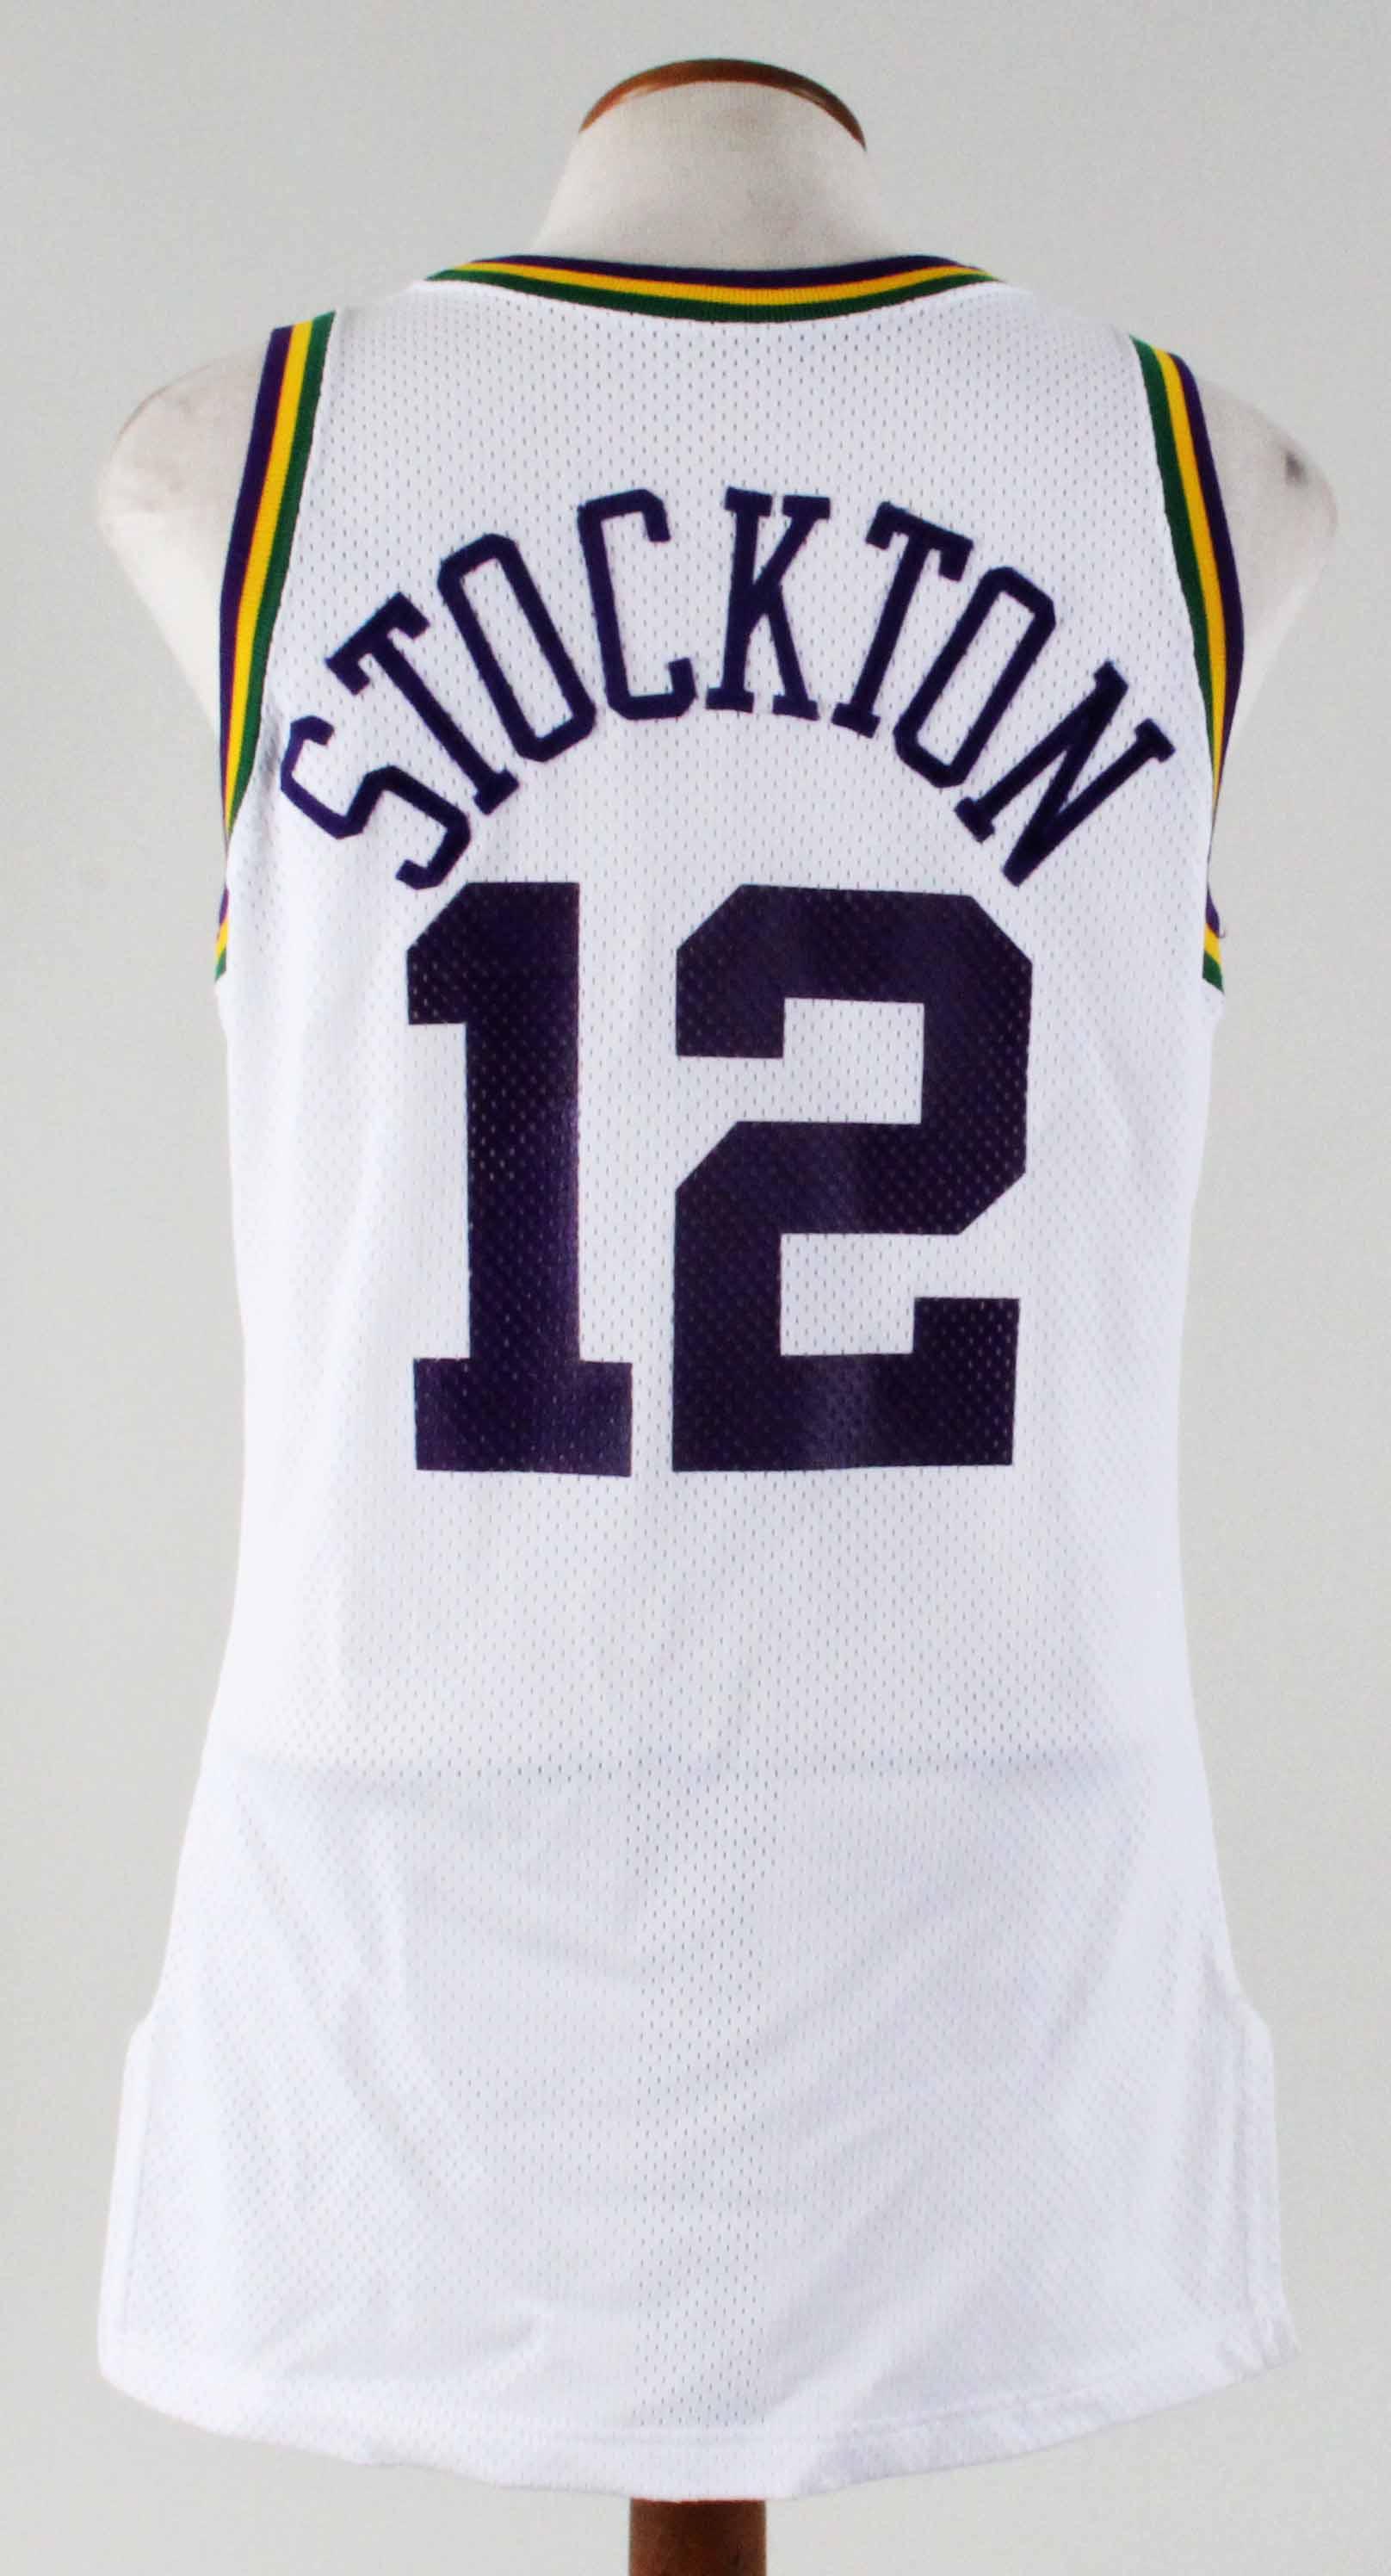 competitive price 8e452 661e5 1994-95 John Stockton Game-Worn Jersey Jazz - COA 100% Authentic Team